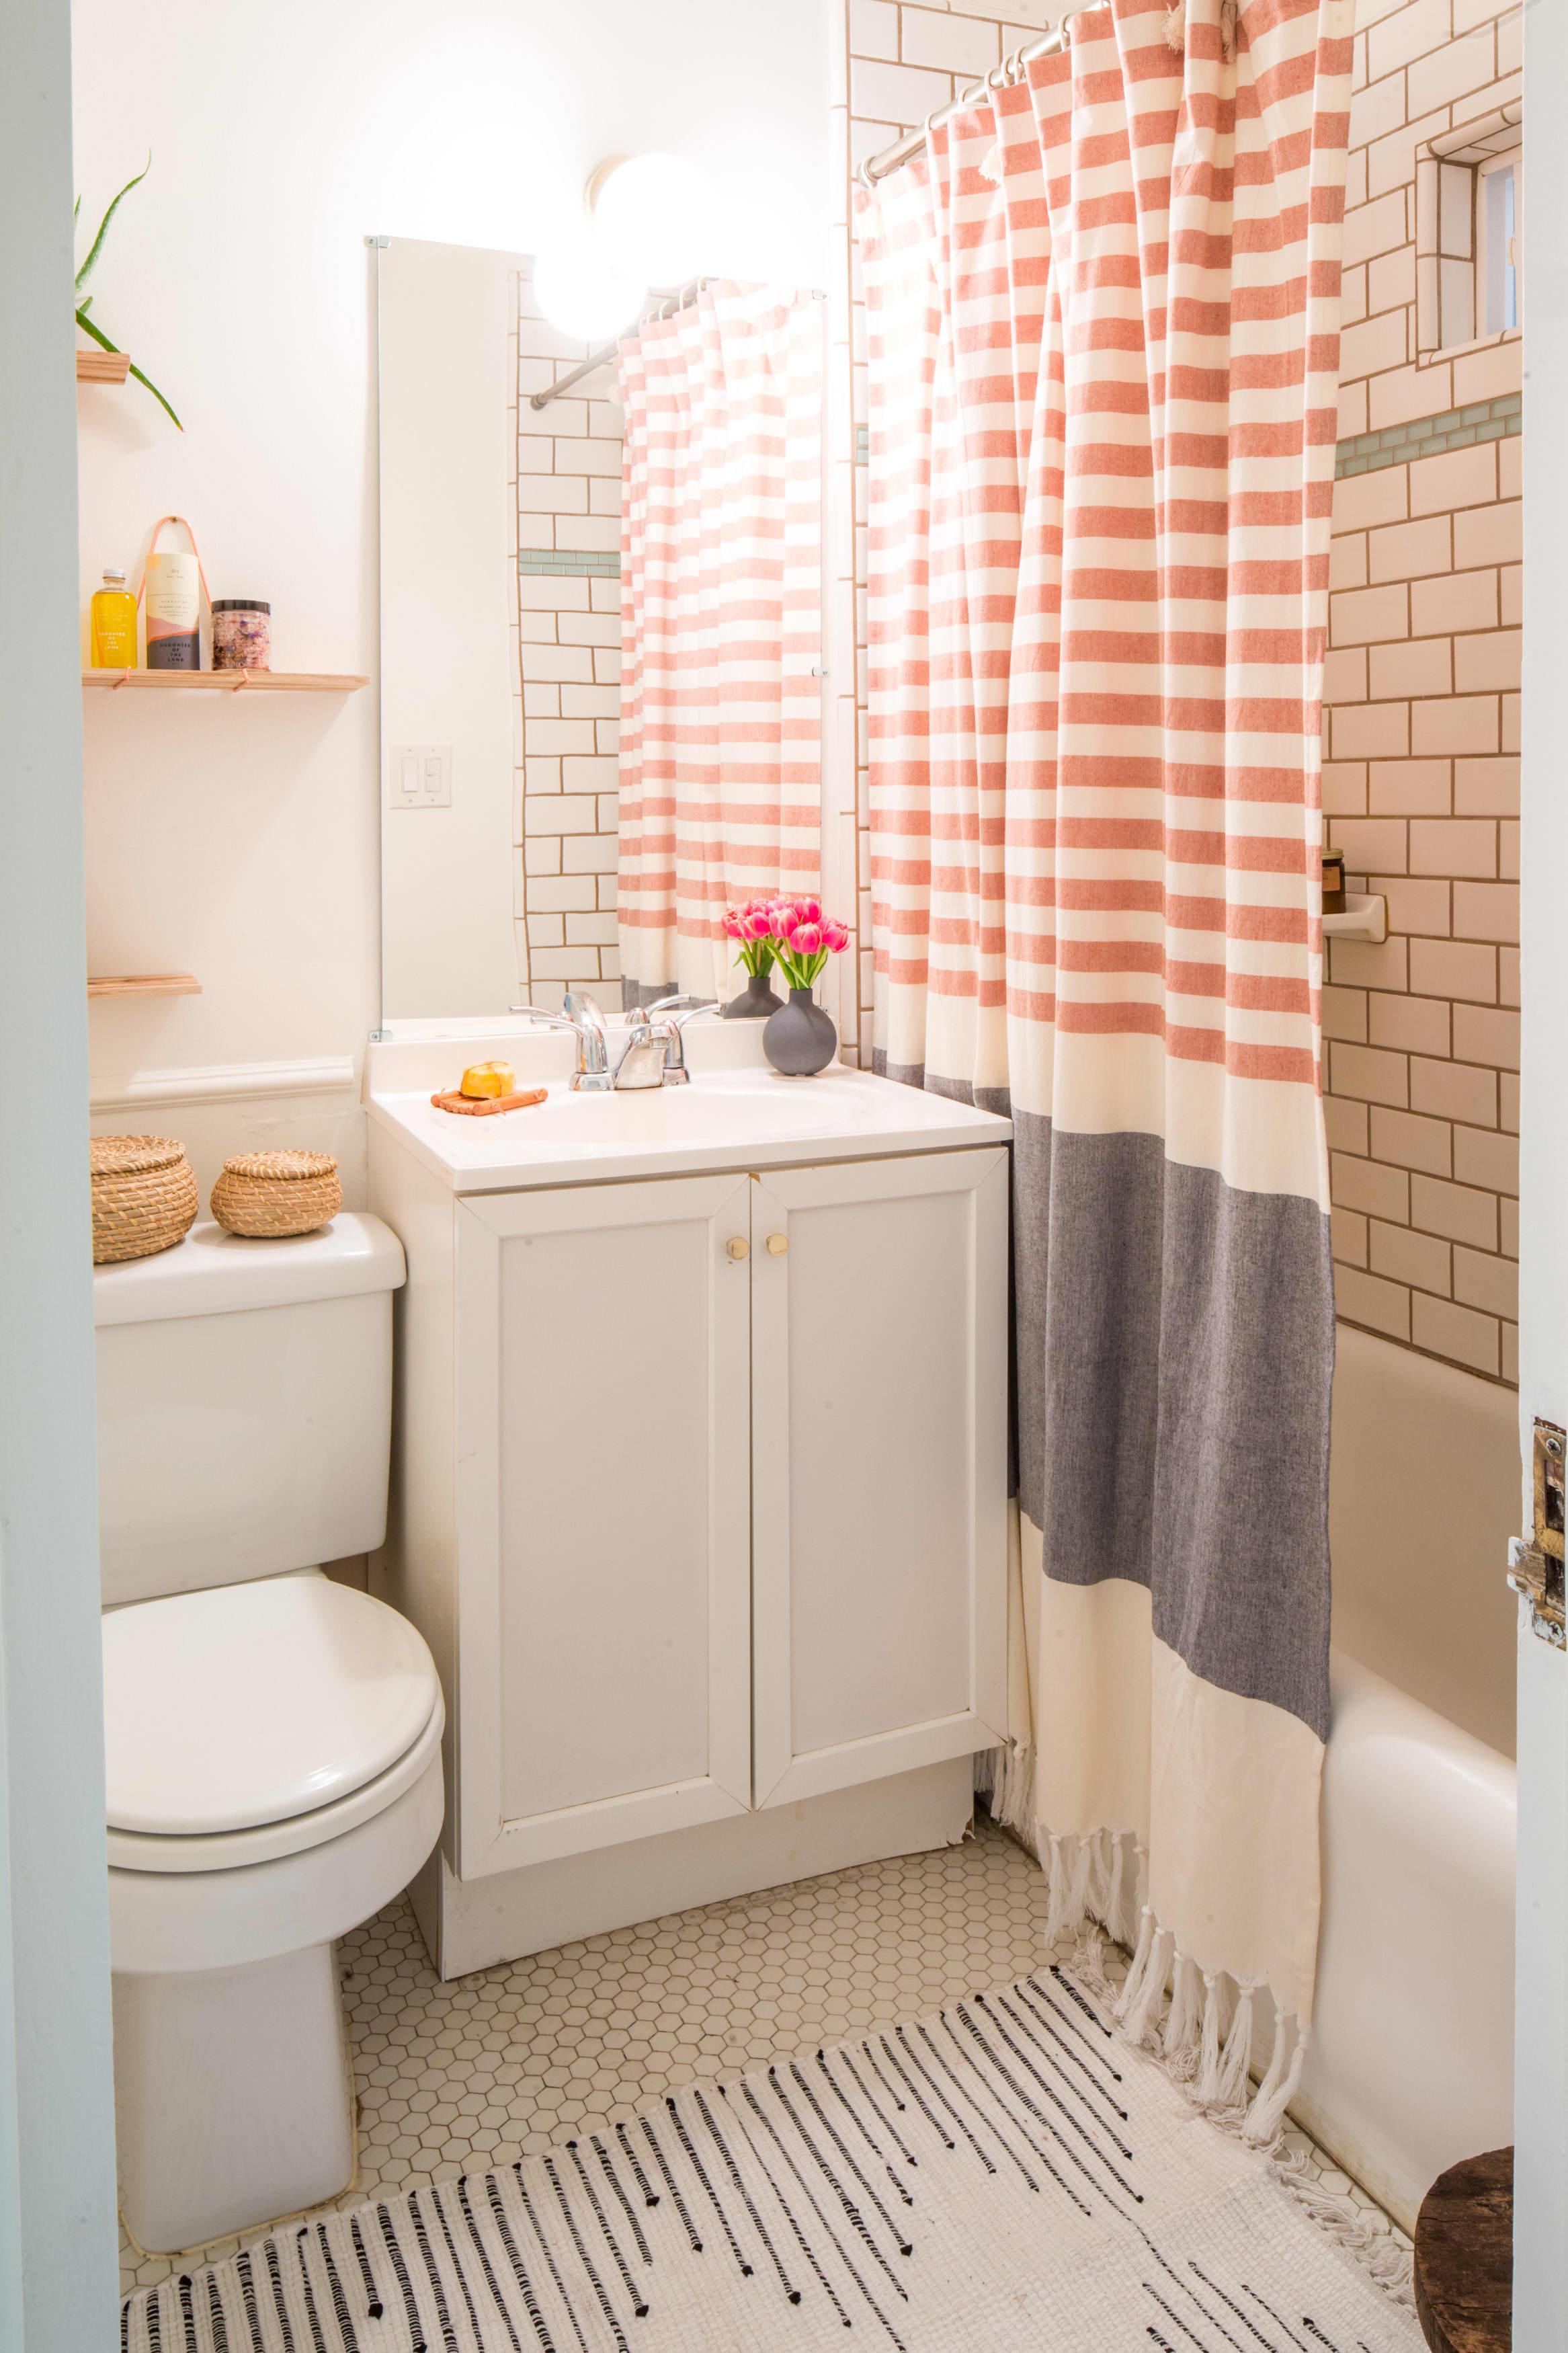 Small Bathroom Design & Storage Ideas | Apartment Therapy